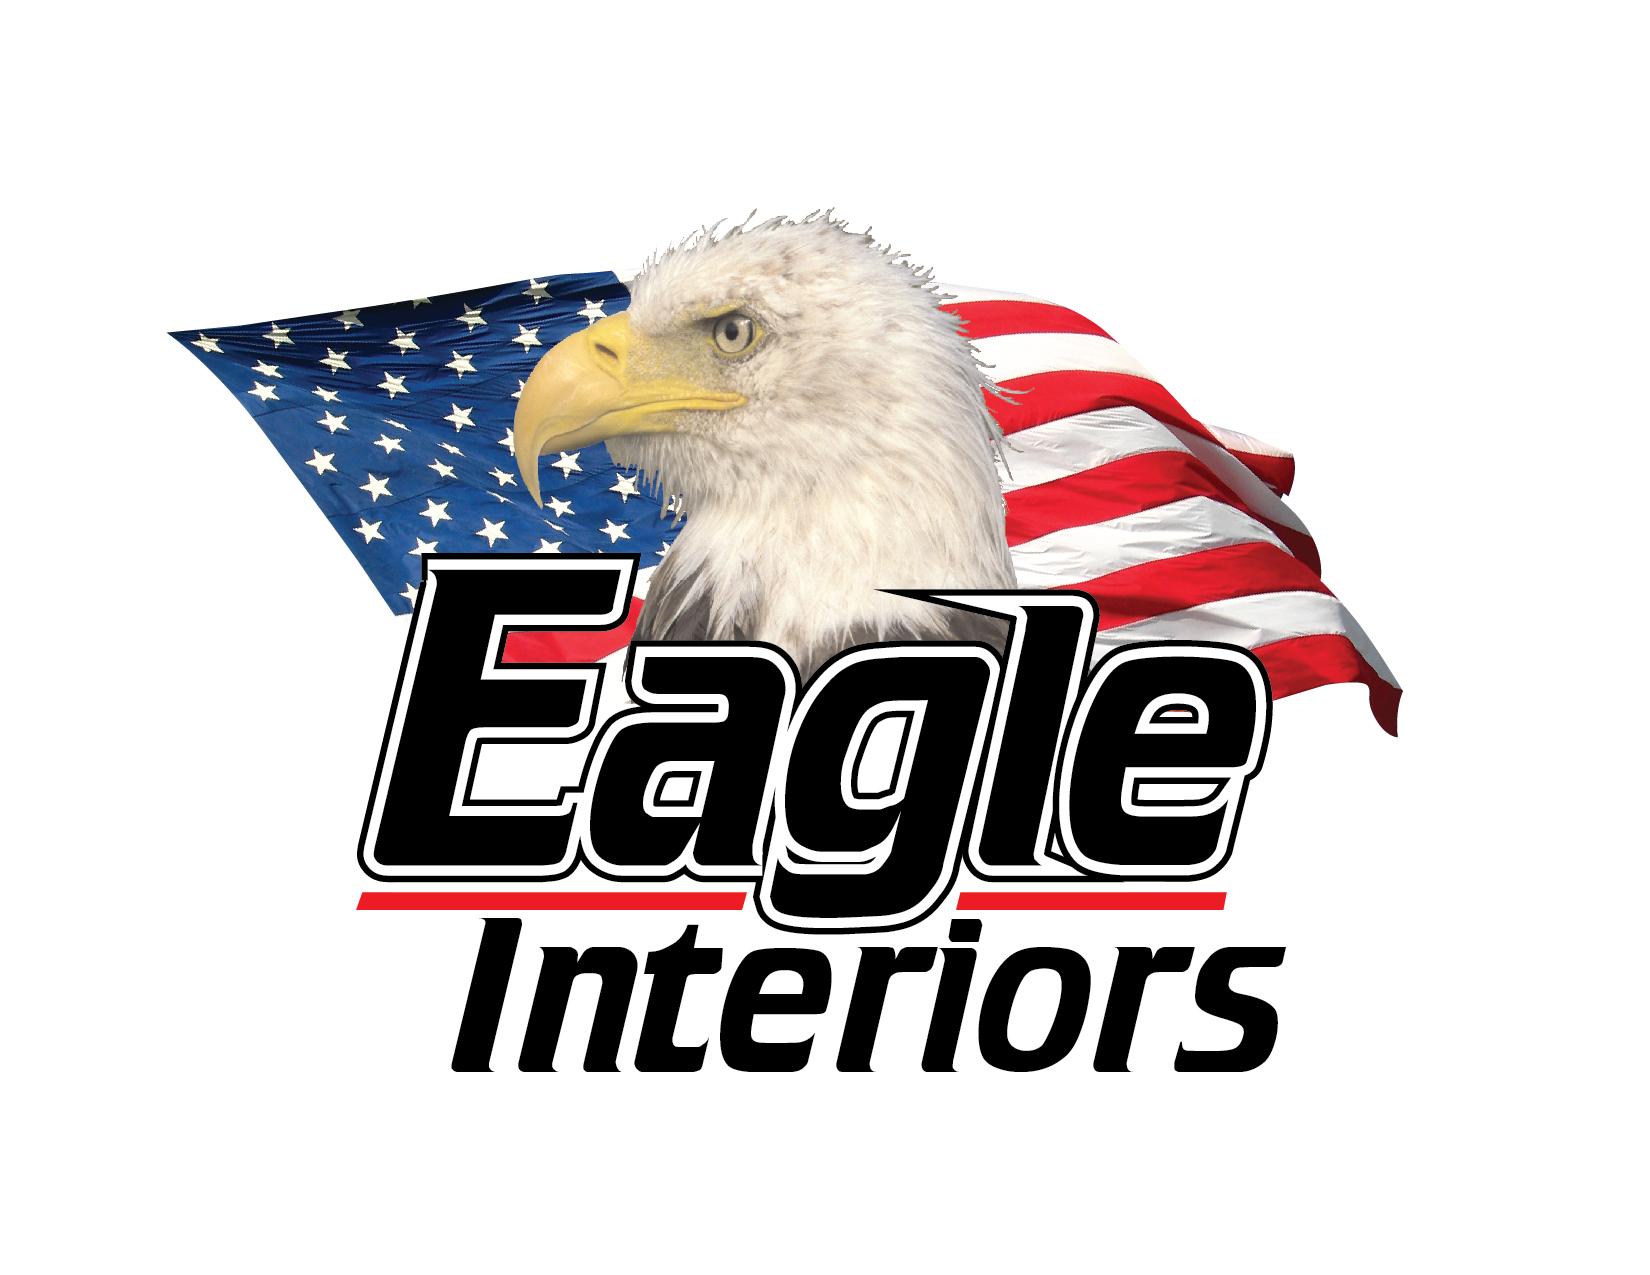 Eagle Interiors LOGO.jpg